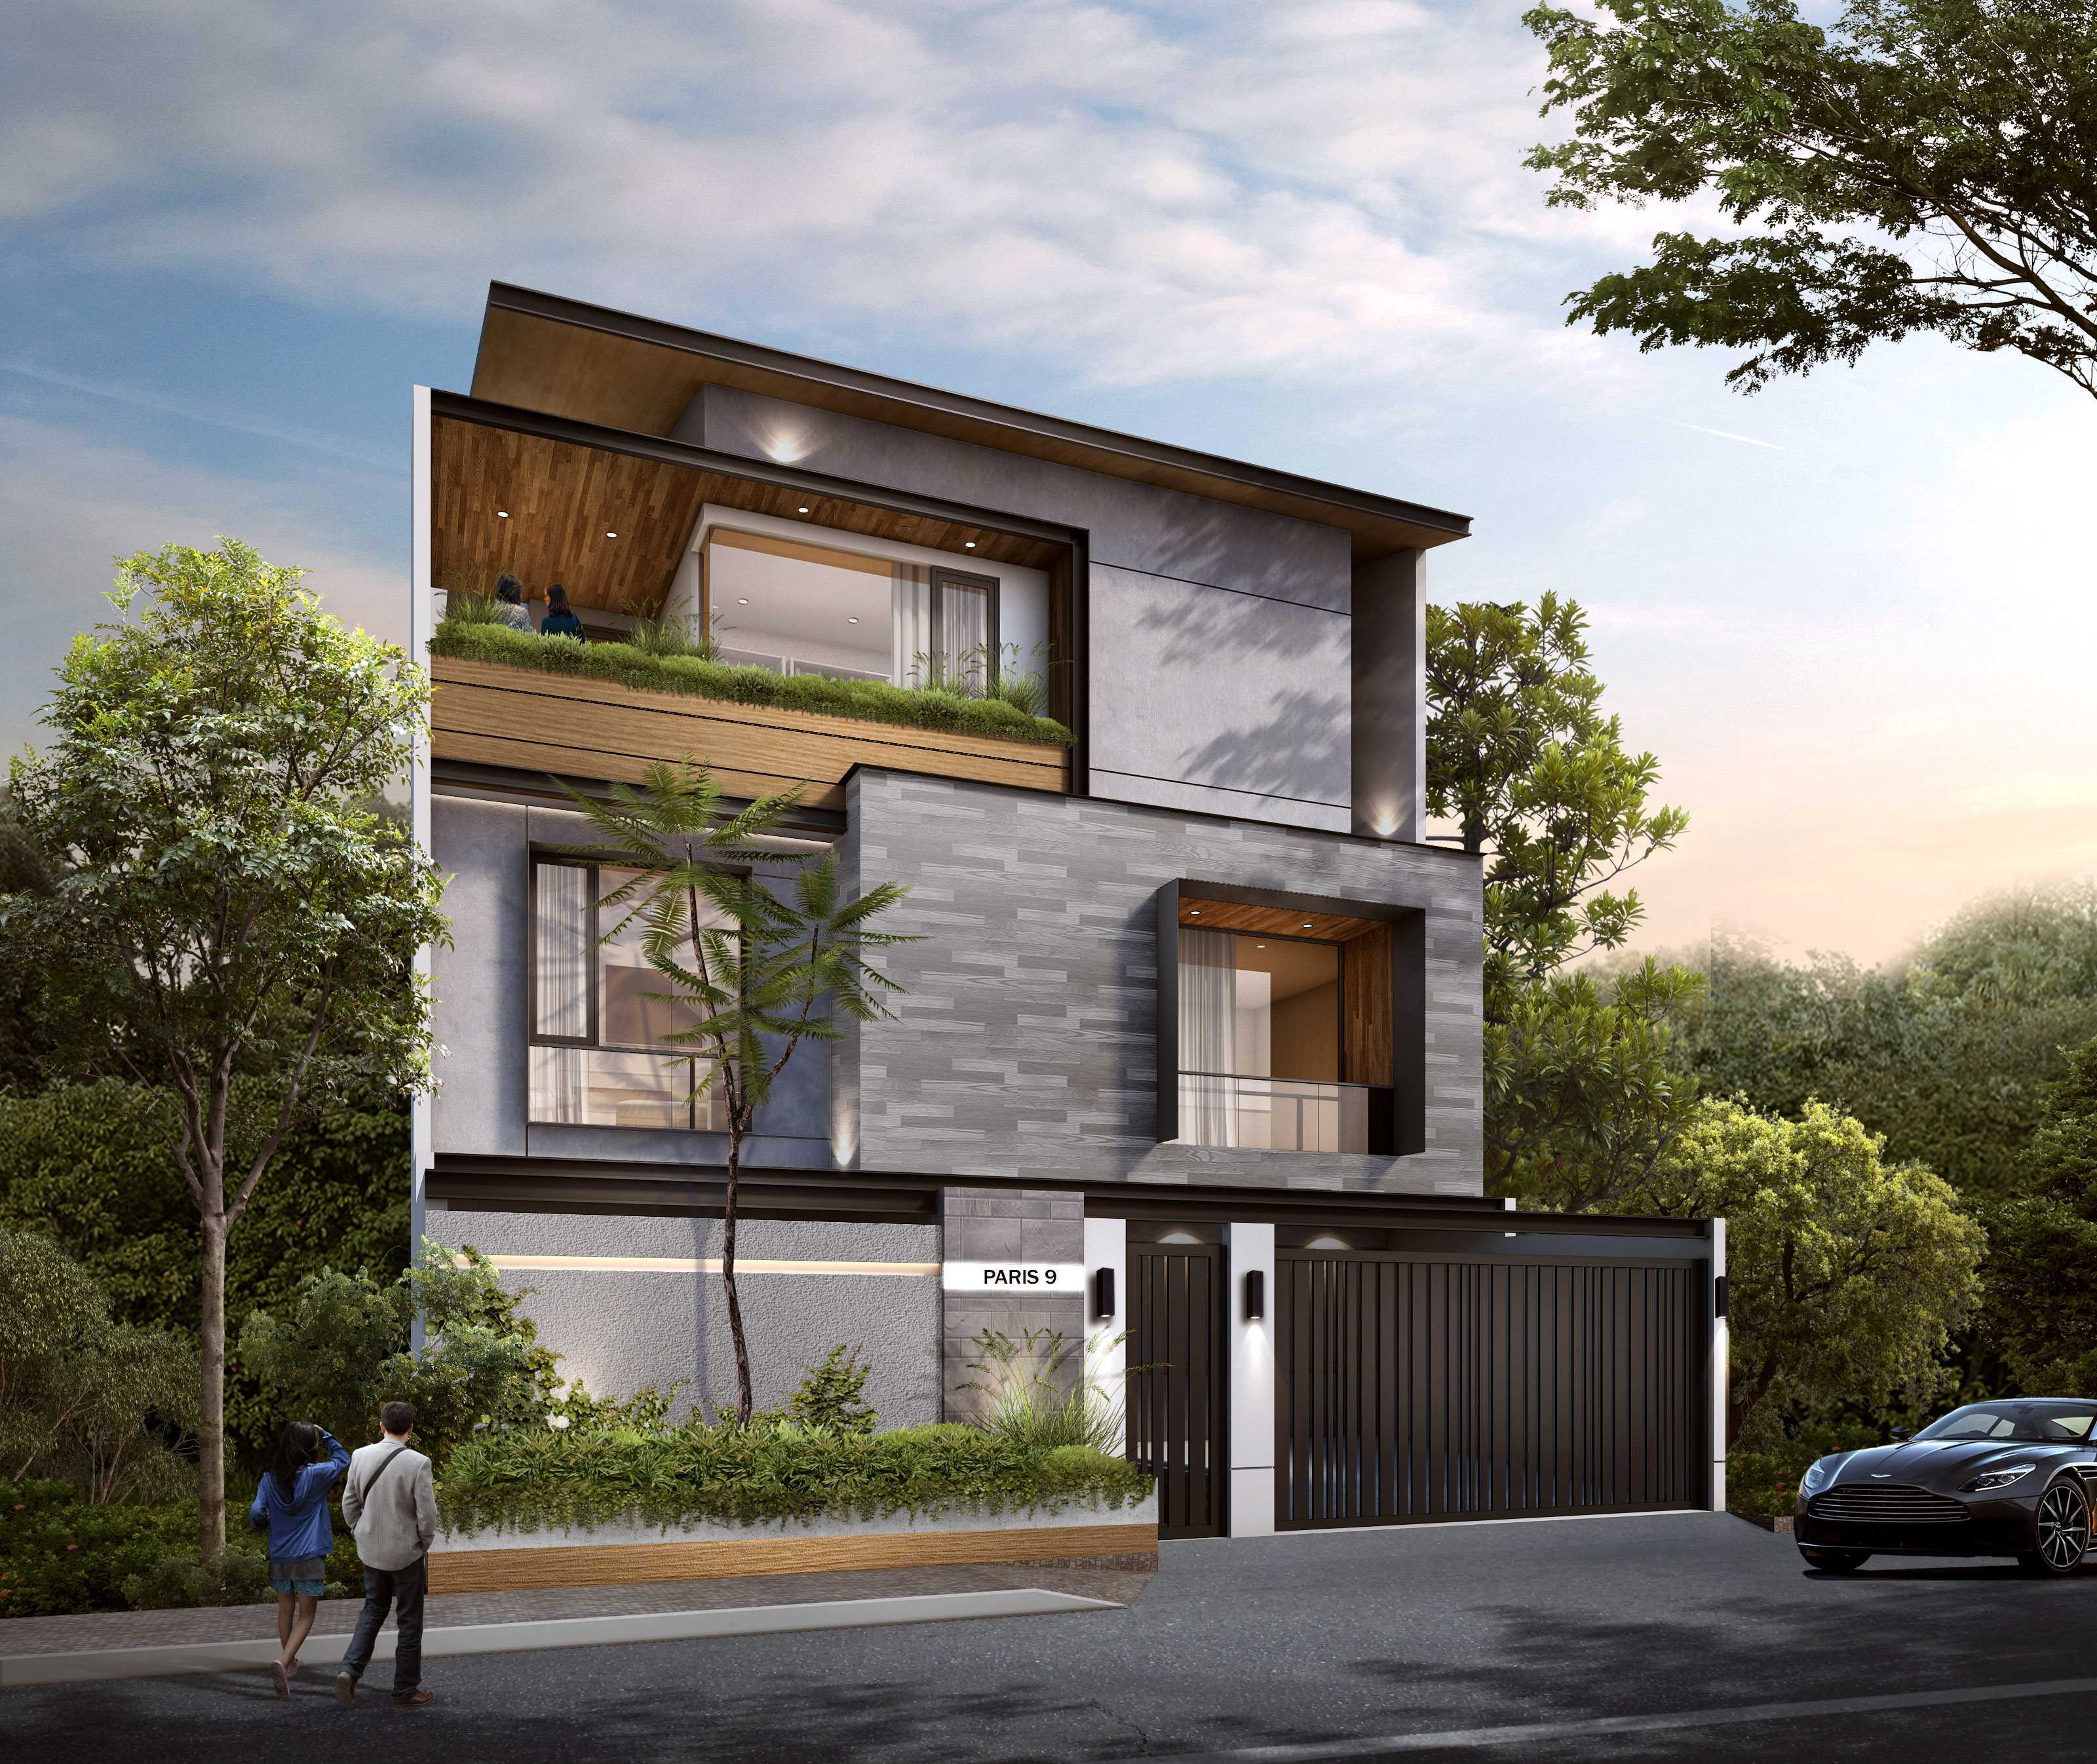 Yoga Irawan Paris House Makassar, Kota Makassar, Sulawesi Selatan, Indonesia Makassar, Kota Makassar, Sulawesi Selatan, Indonesia Yoga-Irawan-Paris-House   87531